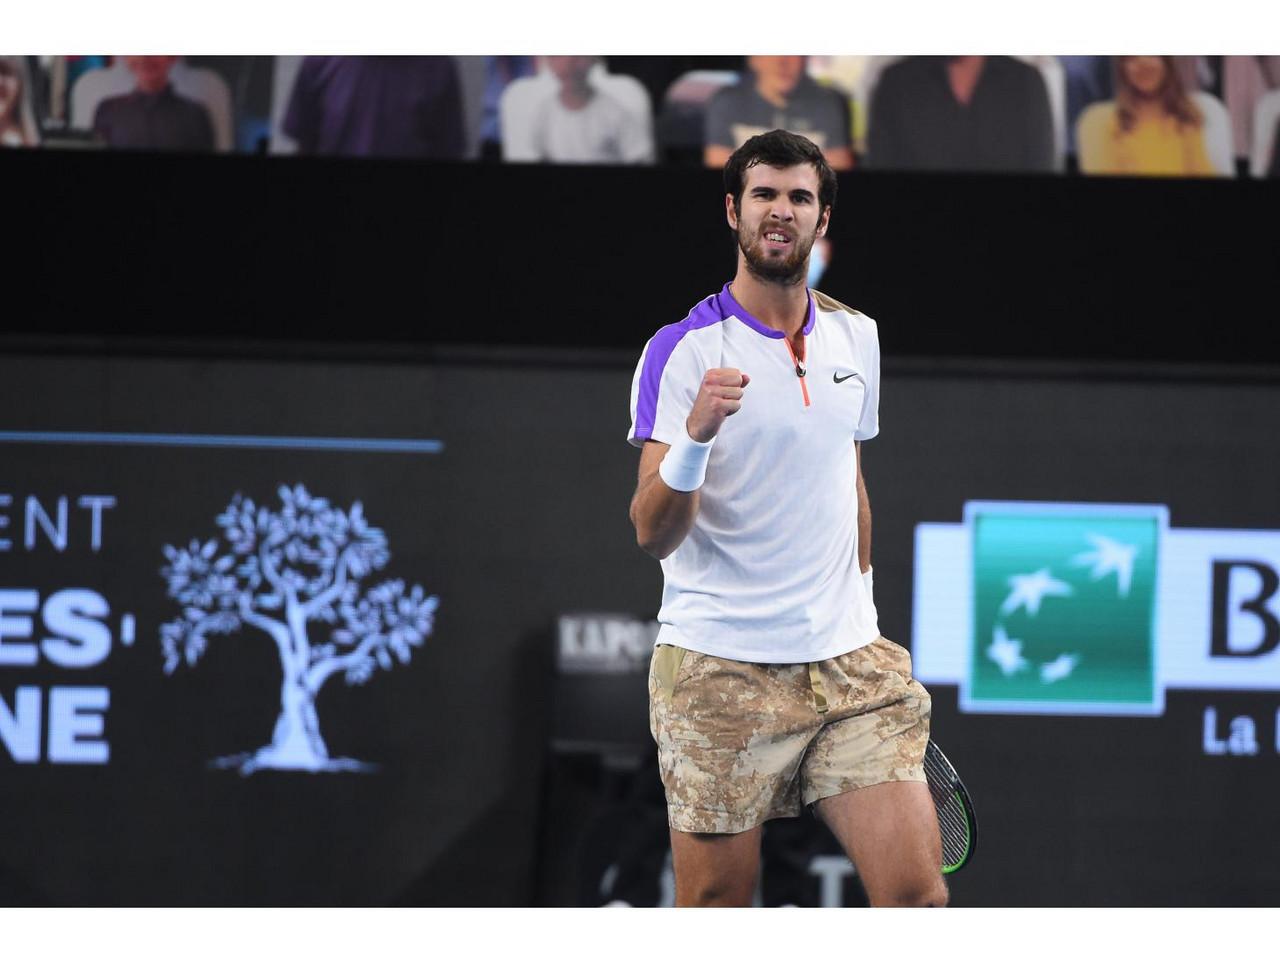 ATP Marseille Day 3 wrapup: Khachanov, Humbert, Sinner advance